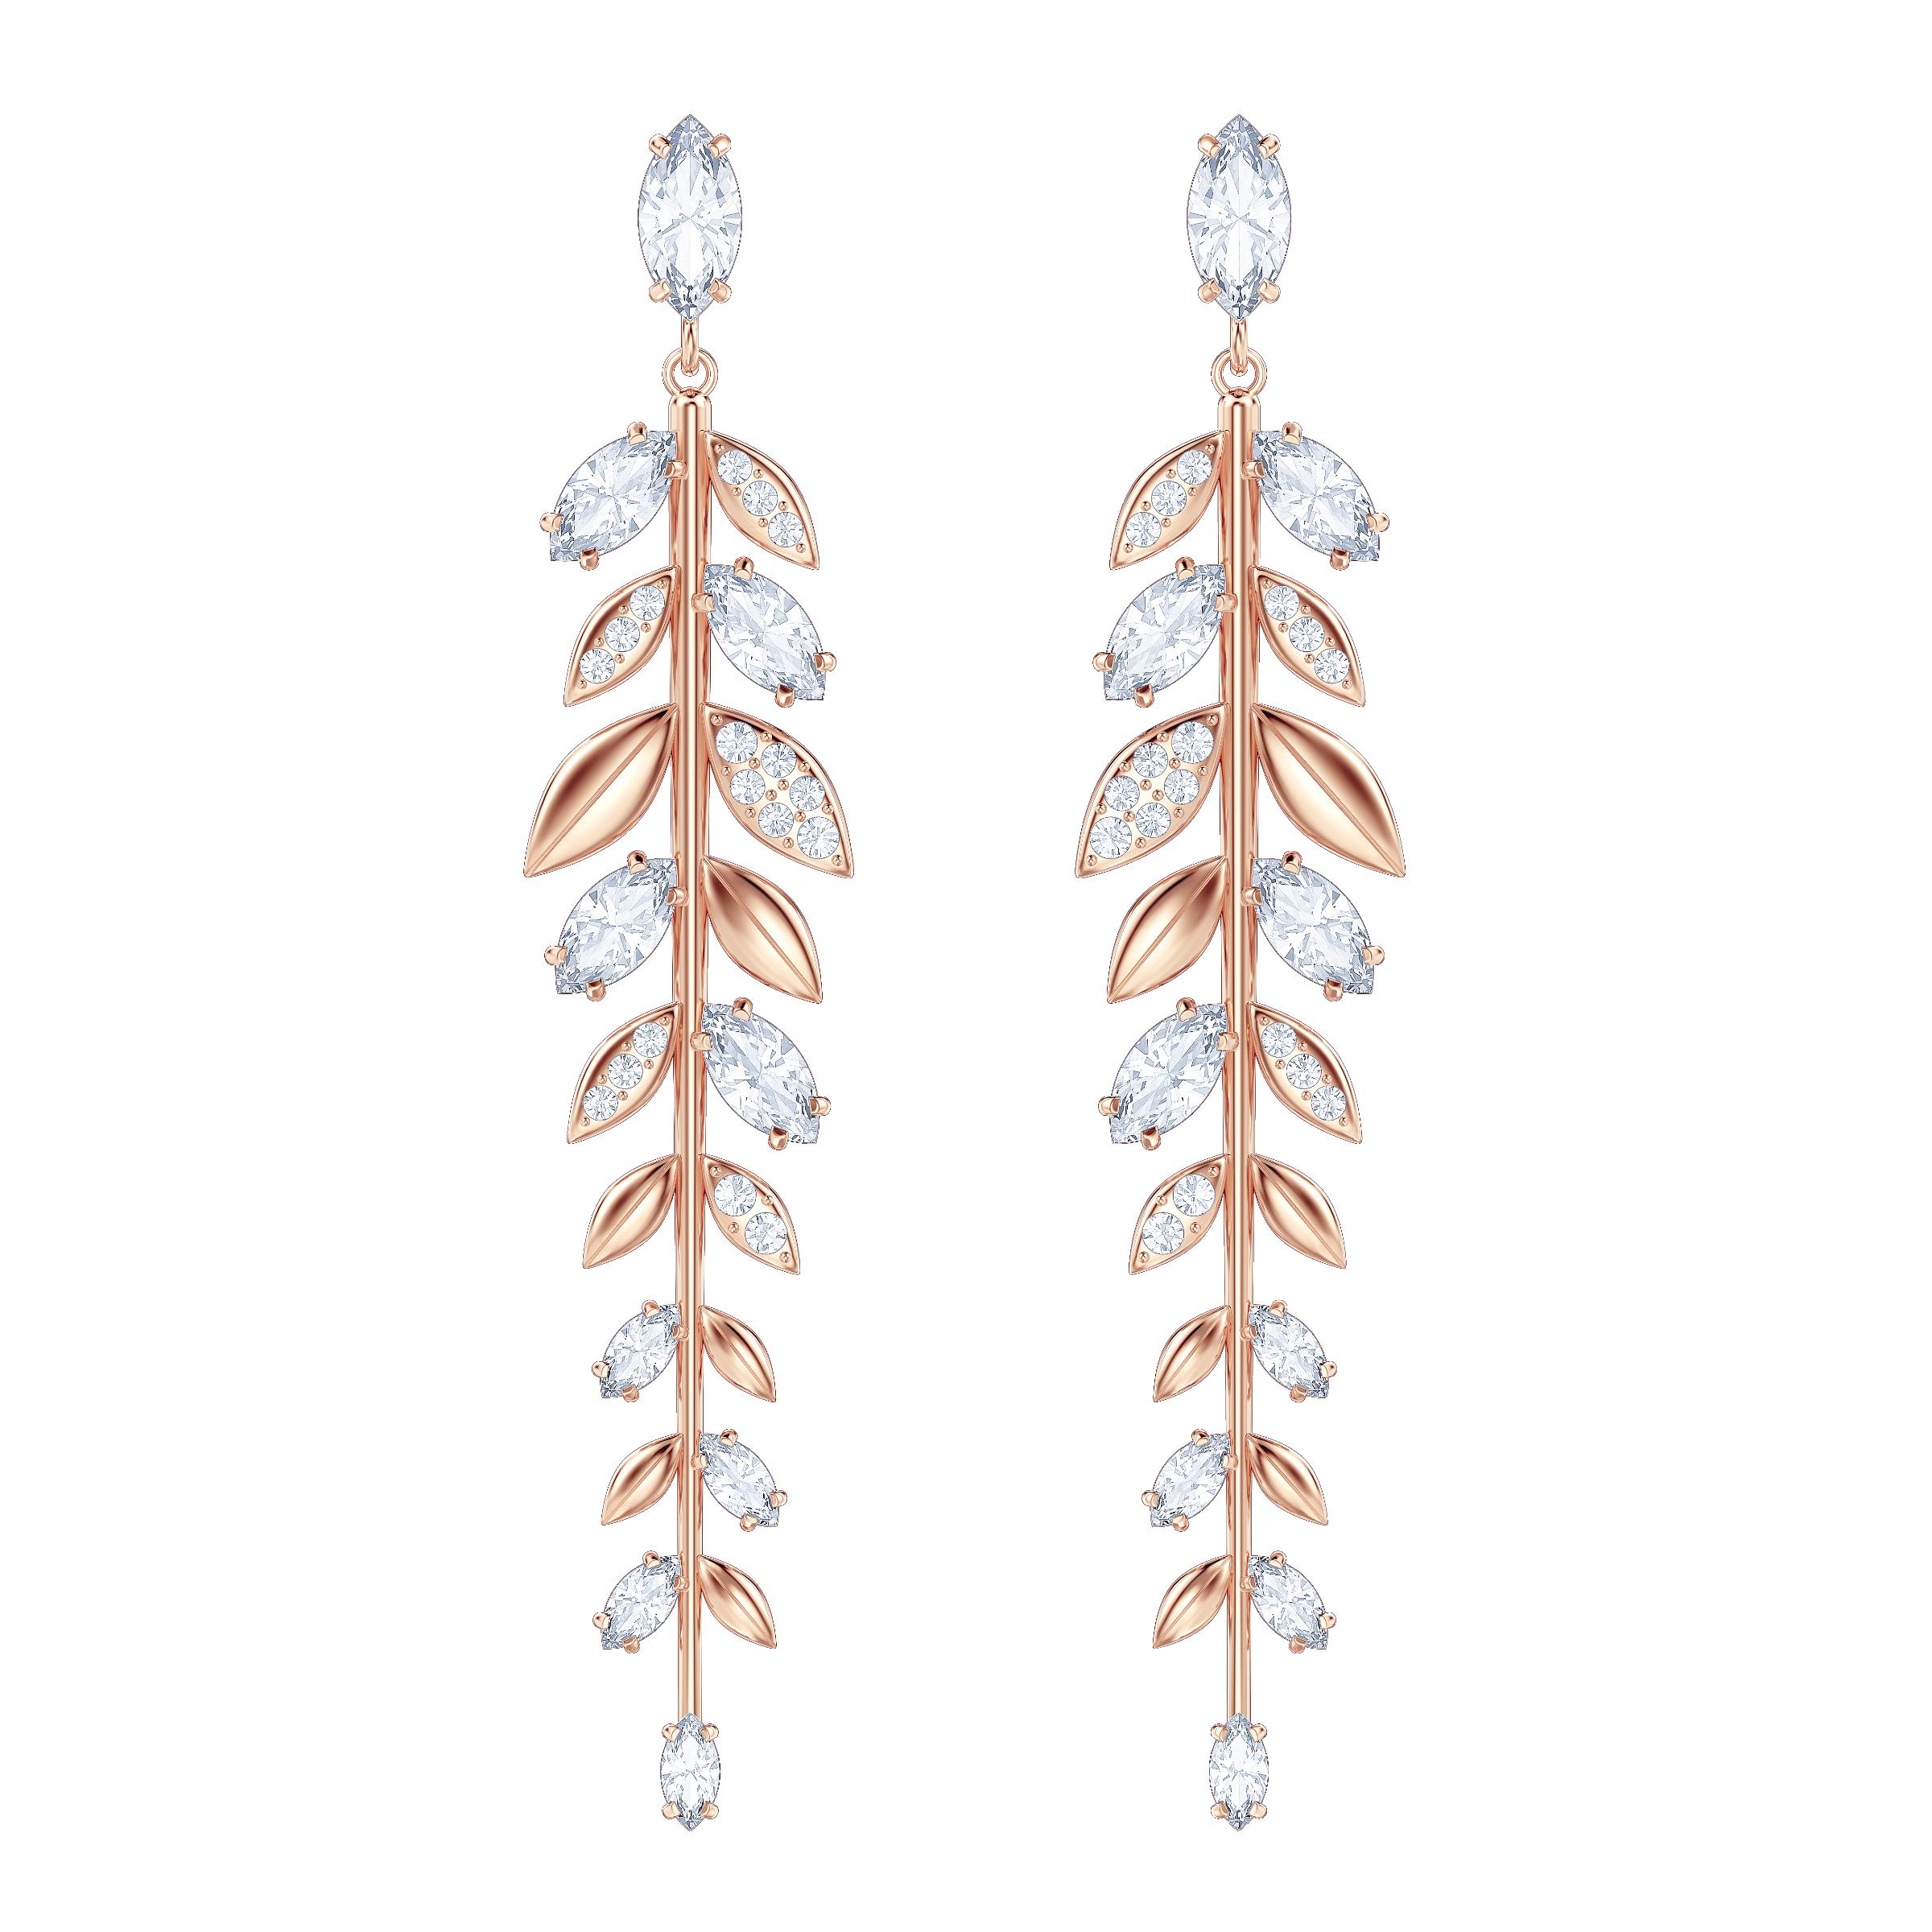 Mayfly Pierced Earrings, Long, White, Rose Gold Plating